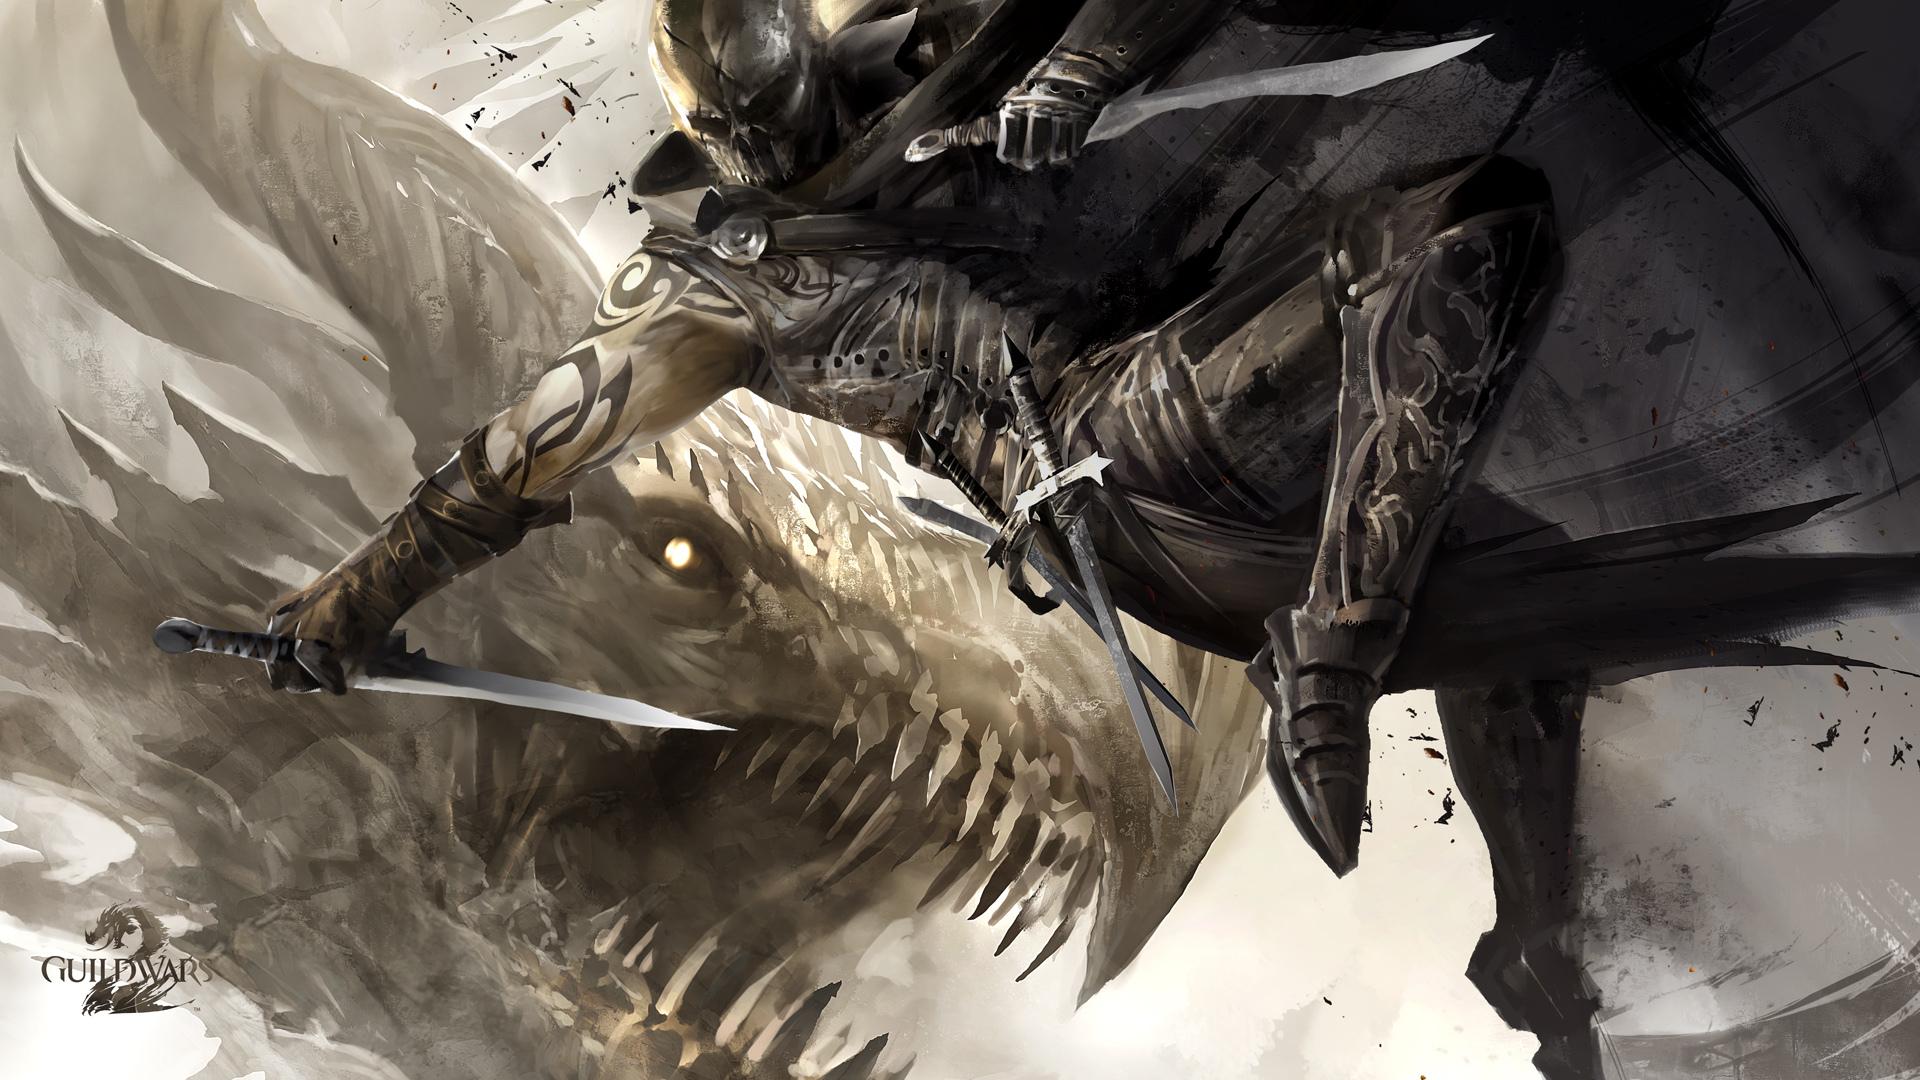 guild wars 2 forum thief concept art armor